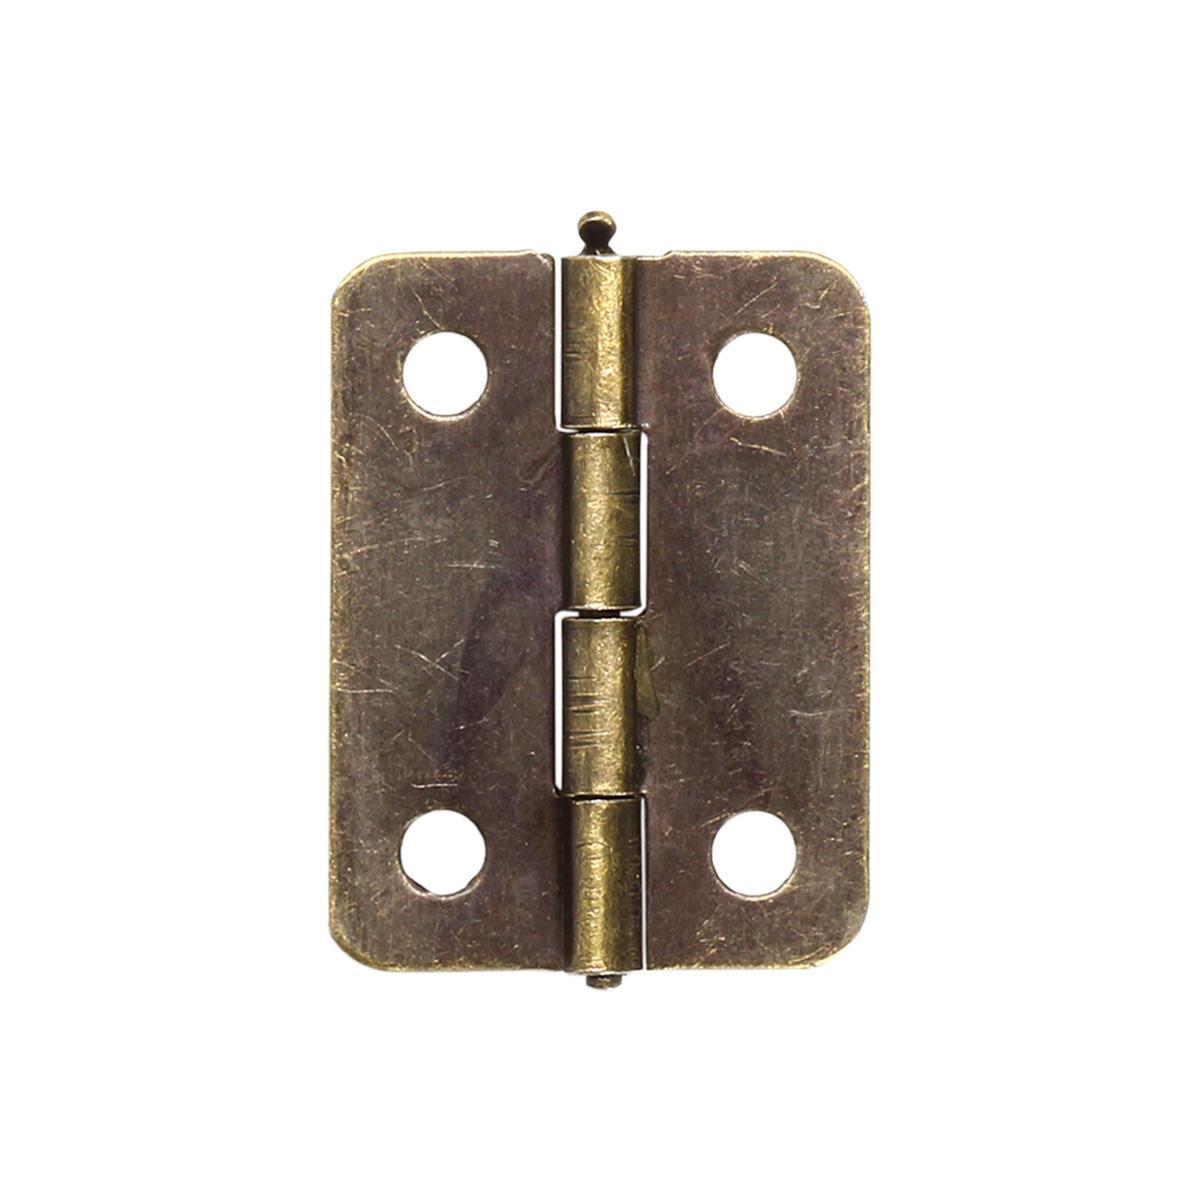 Петля для шкатулок 15*24 мм, 2шт бронза